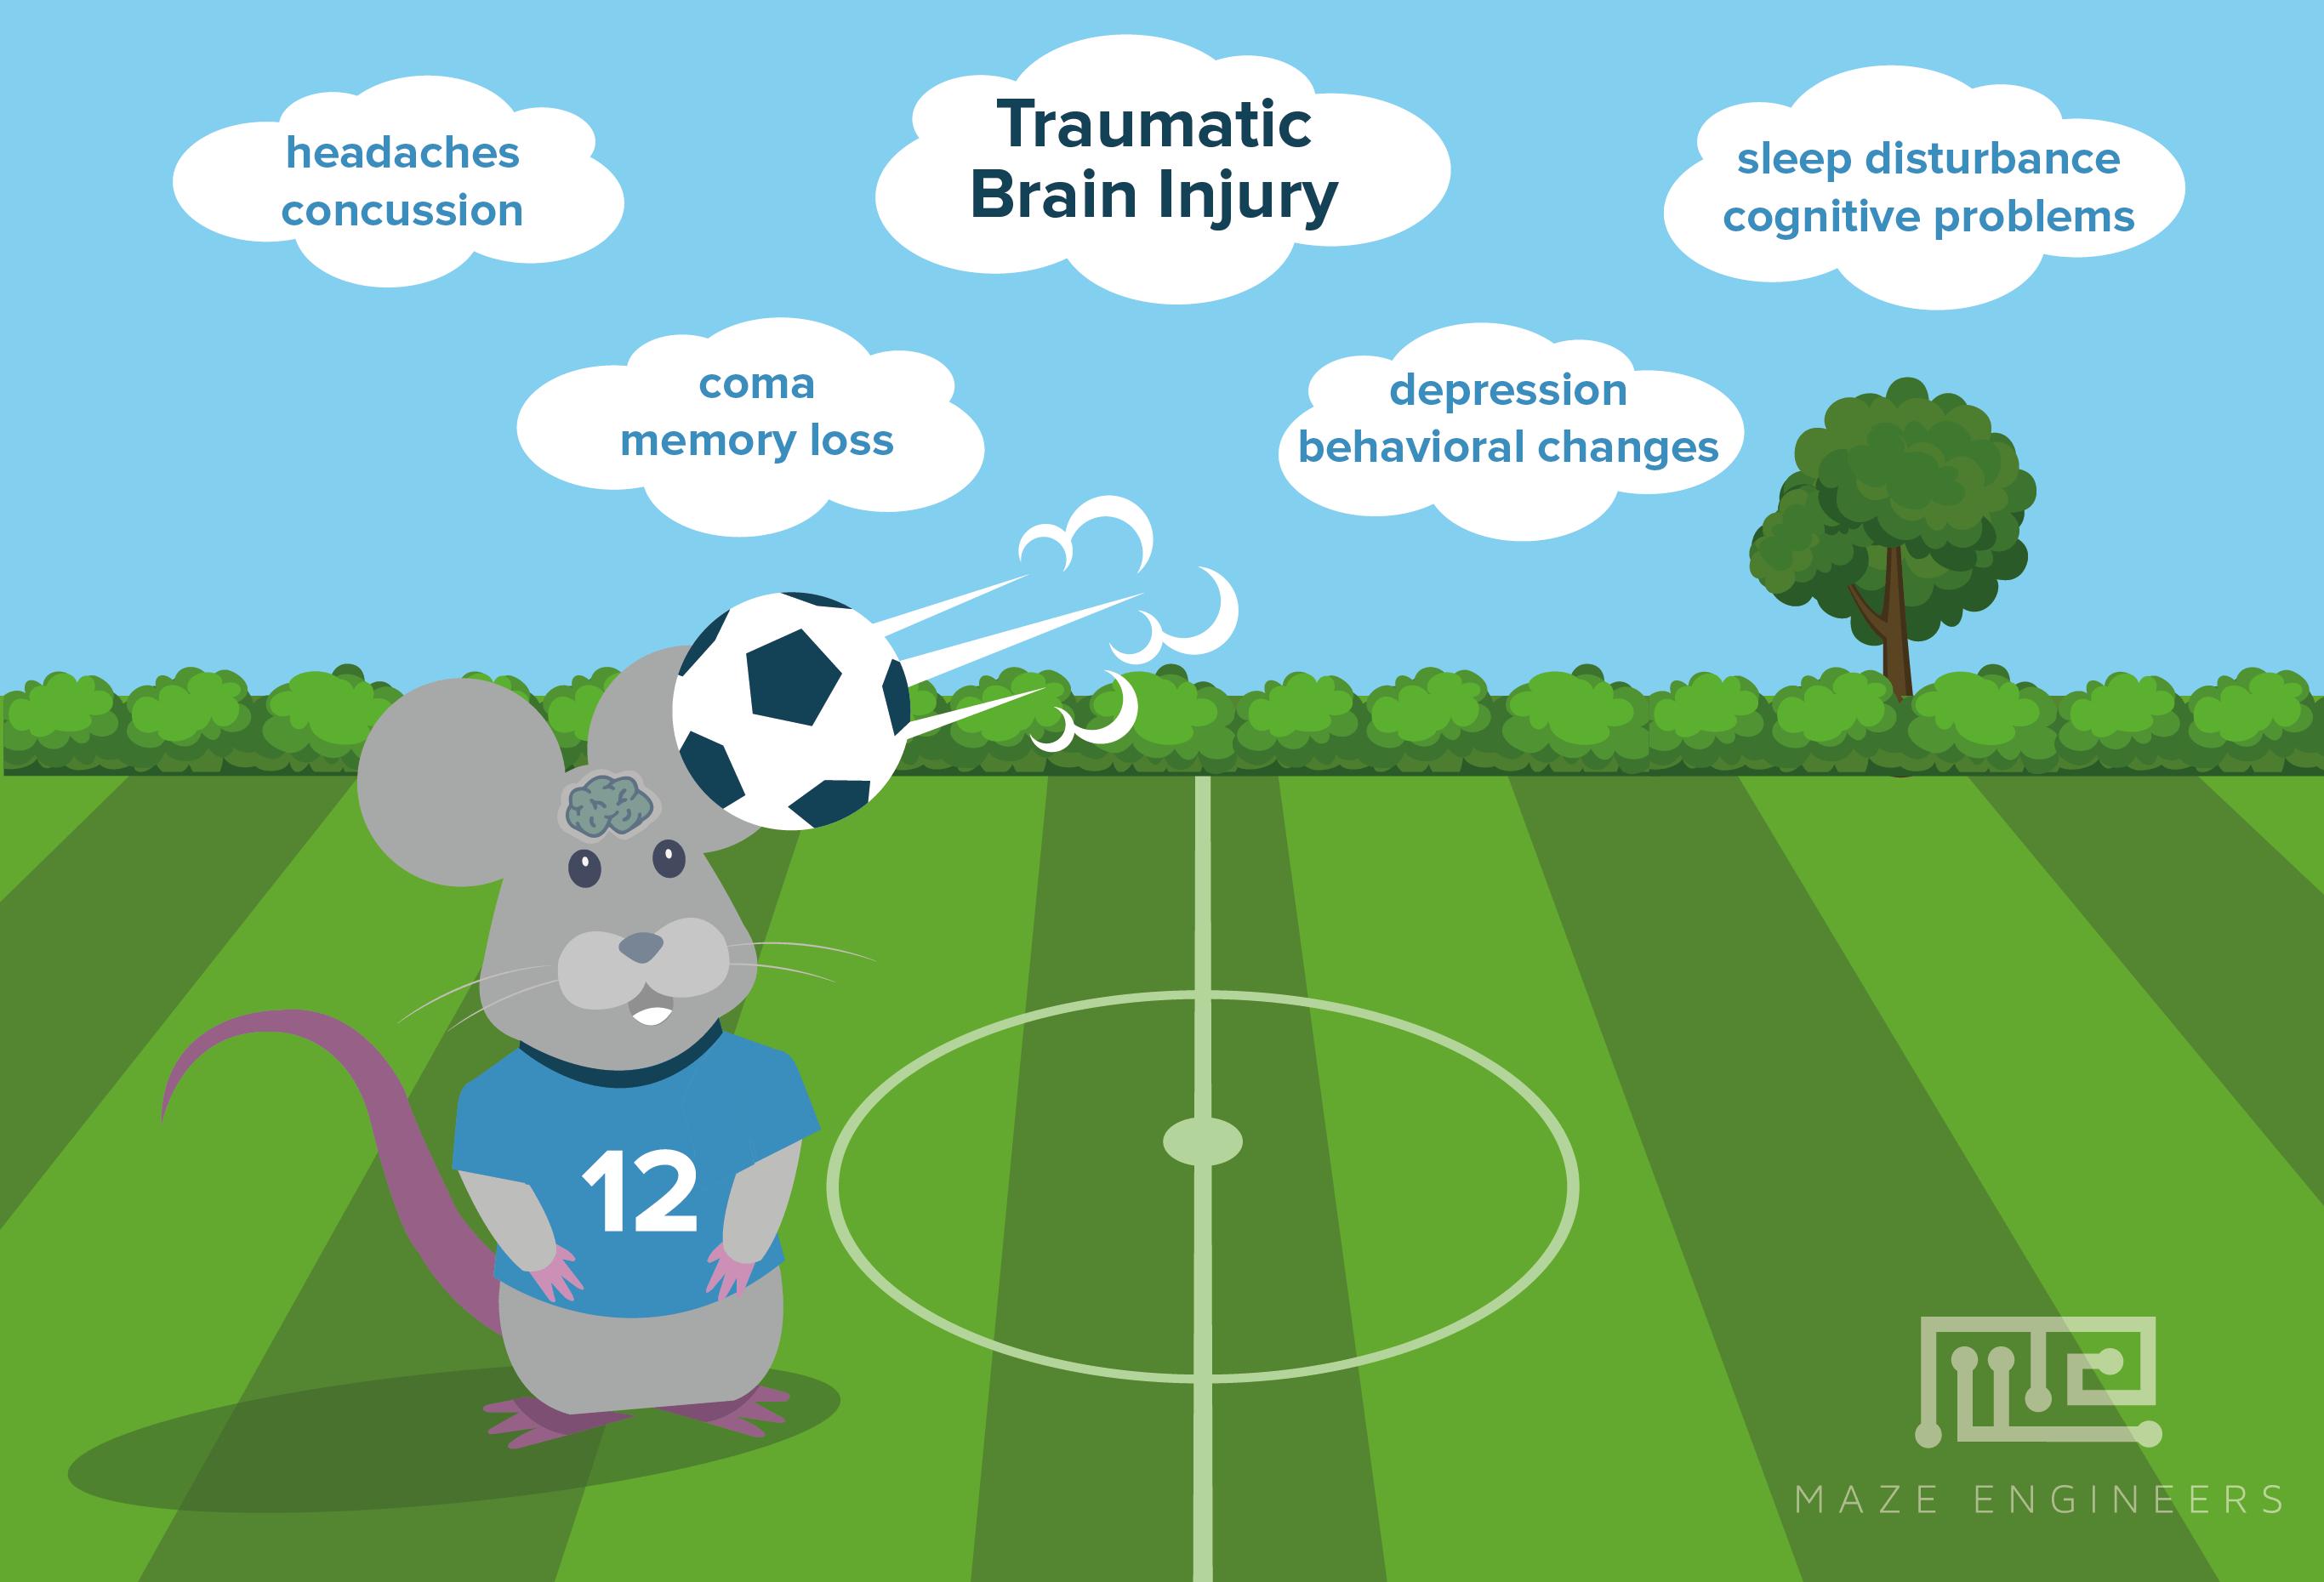 symptoms of Traumatic Brain Injury in sports